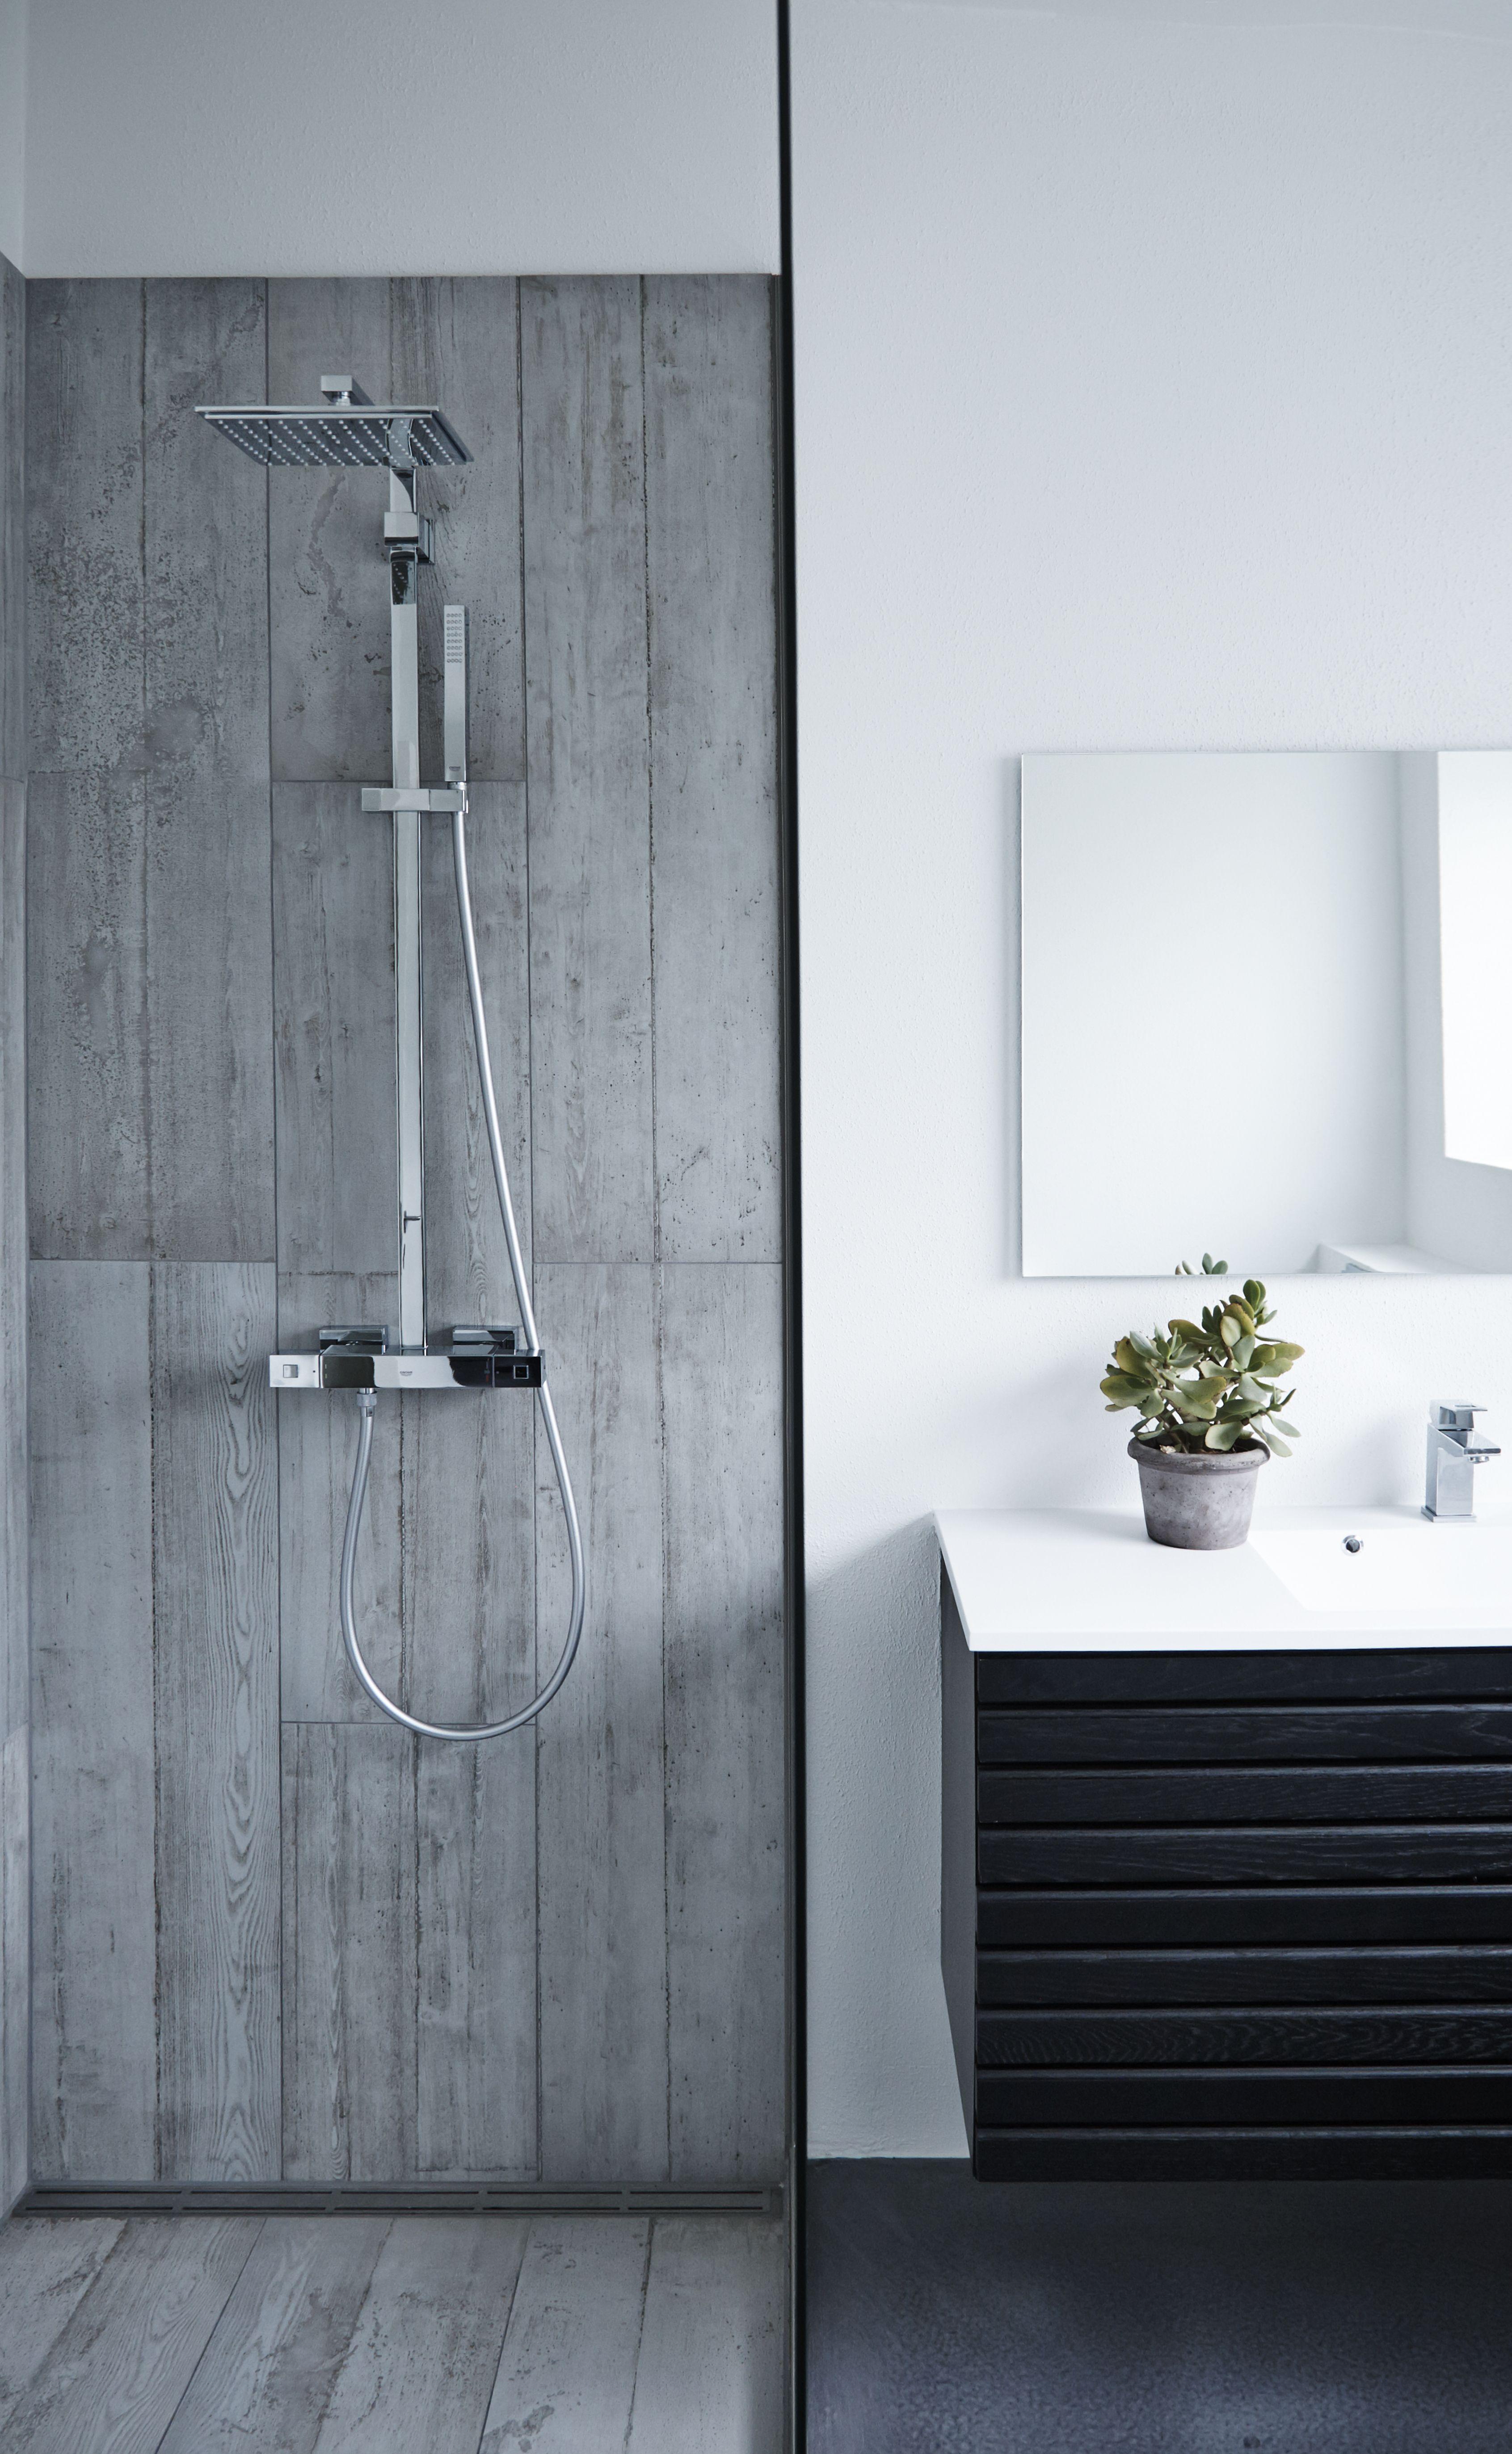 Beautiful bathroom withscandinavian bathroom with ClassicLine